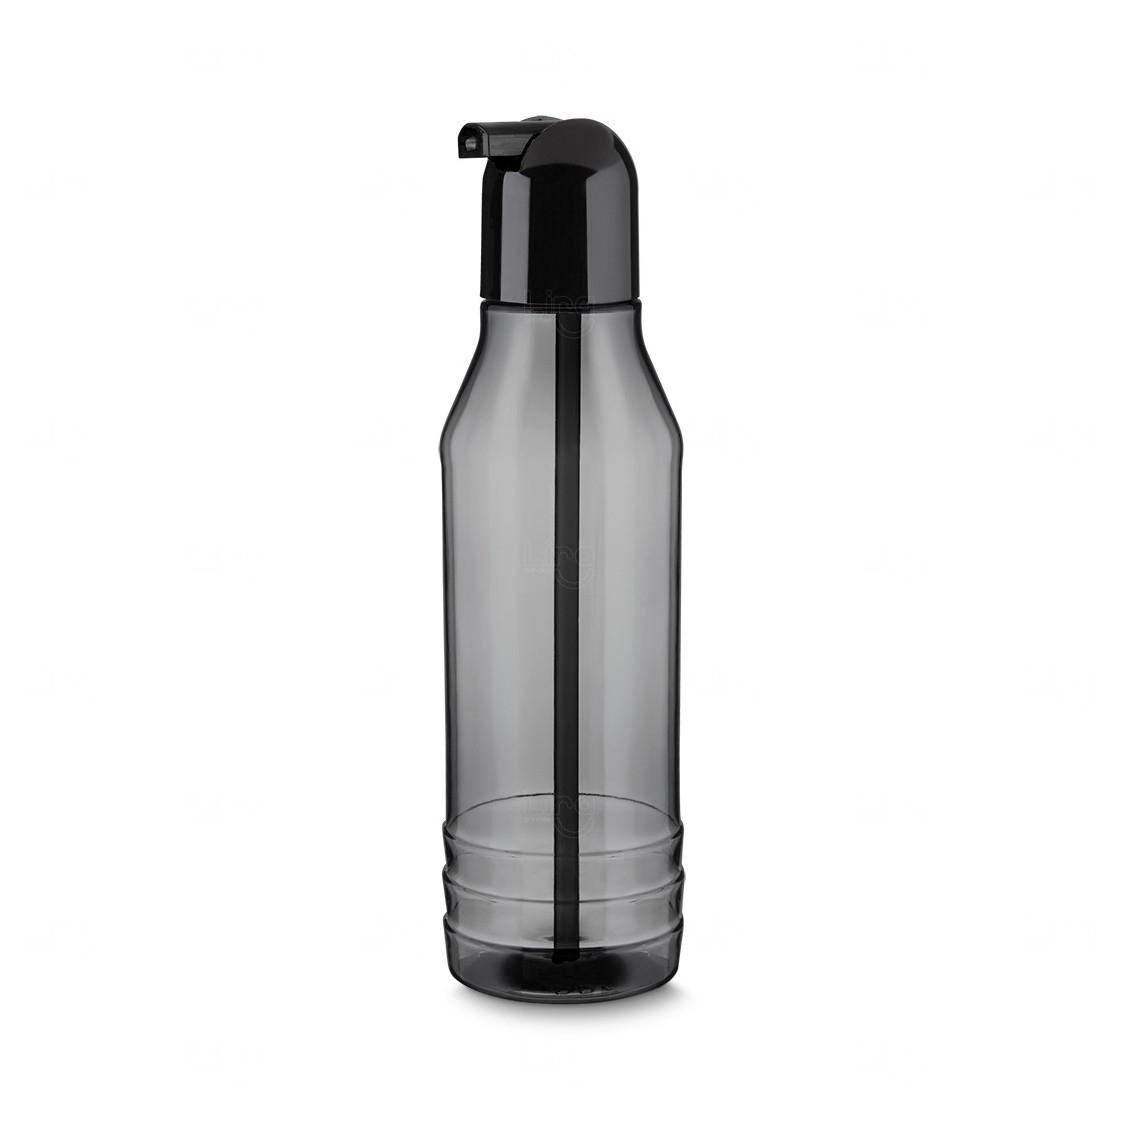 Garrafa Squeeze Plástico Personalizada - 600 ml Preto